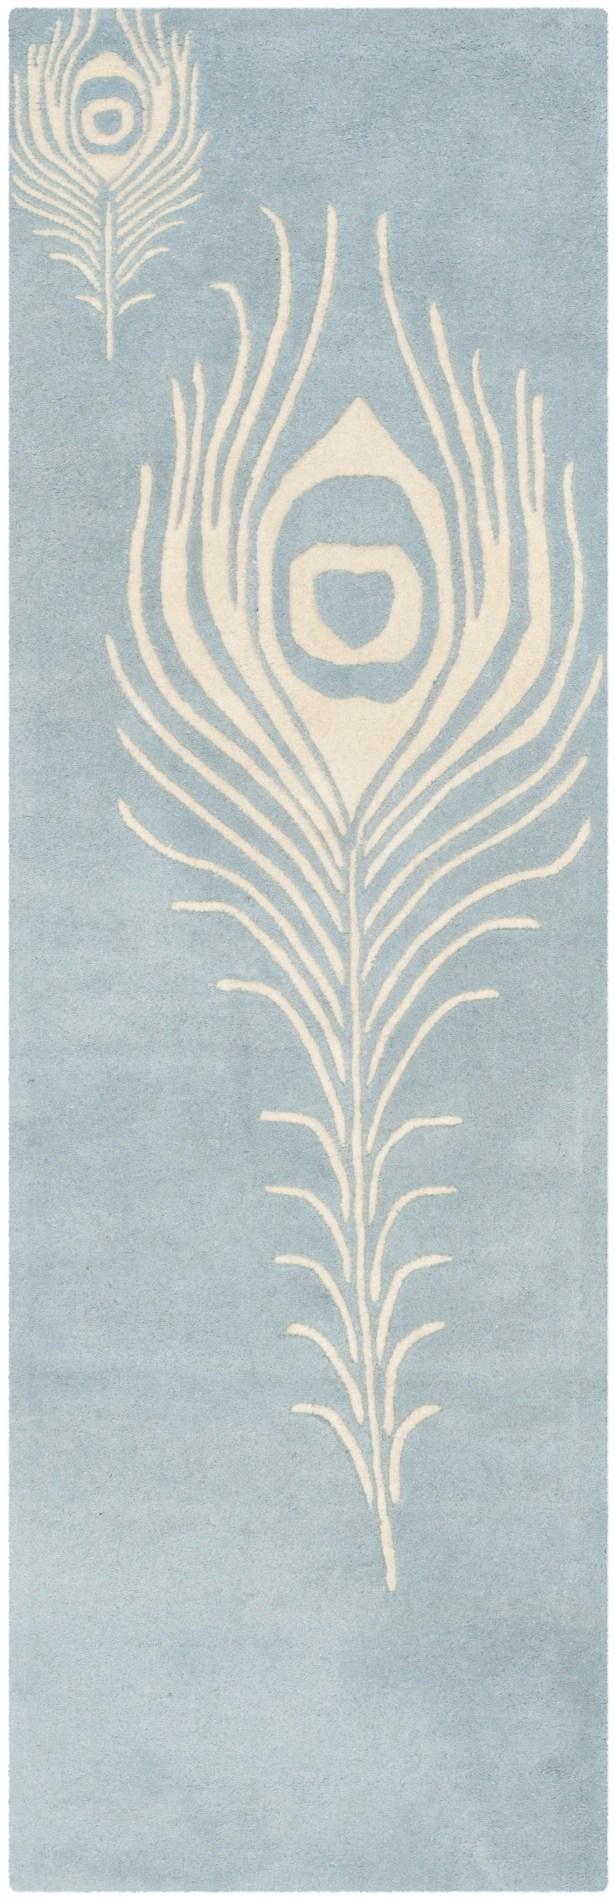 Dorthy Light Blue / Ivory Contemporary Rug Rug Size: Runner 2'6